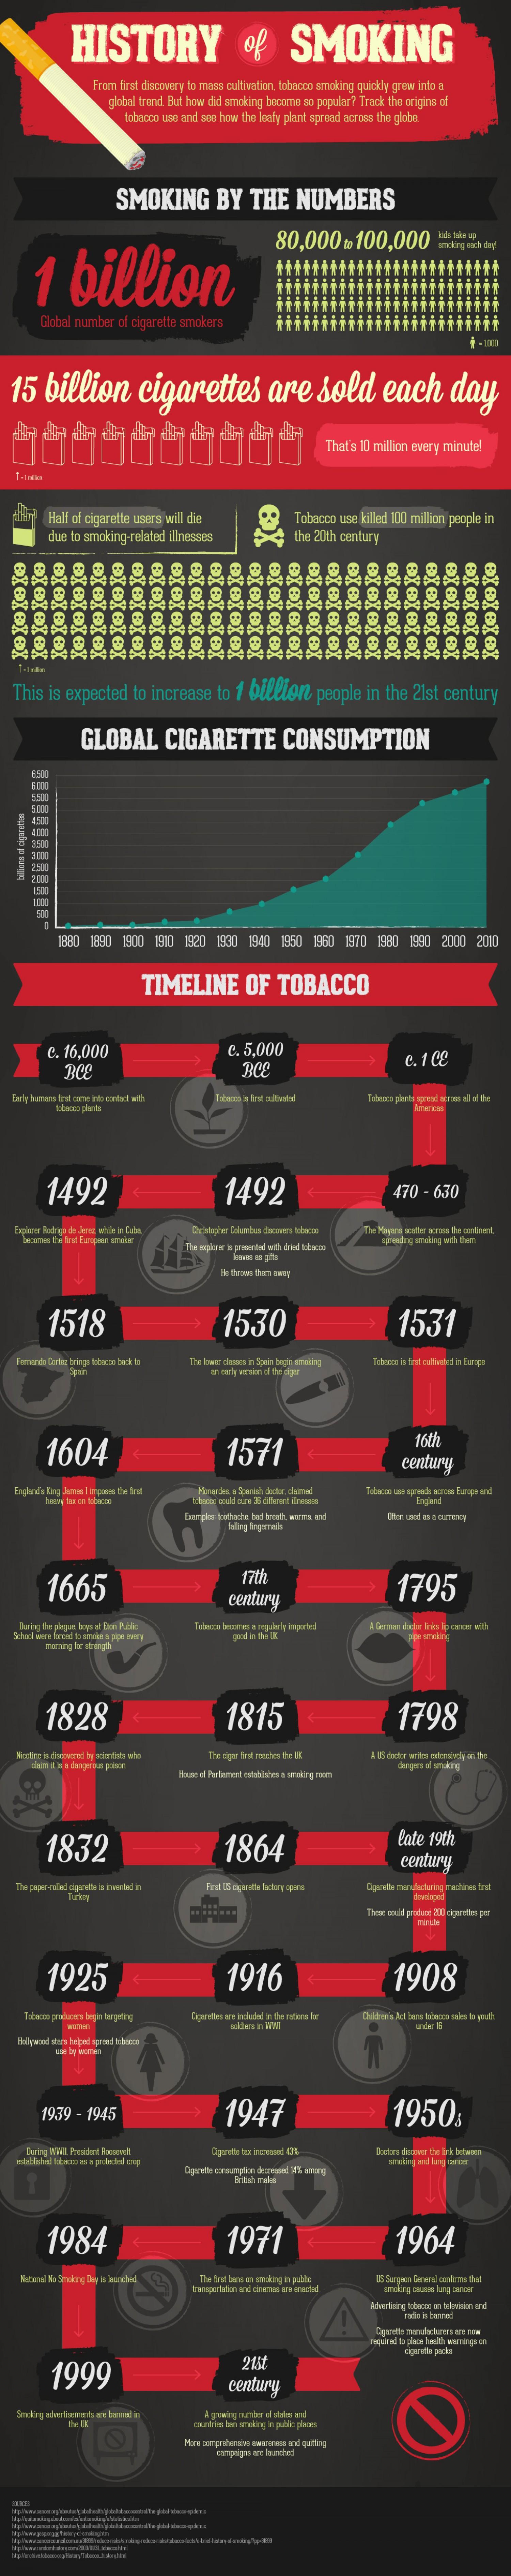 7. History of Smoking